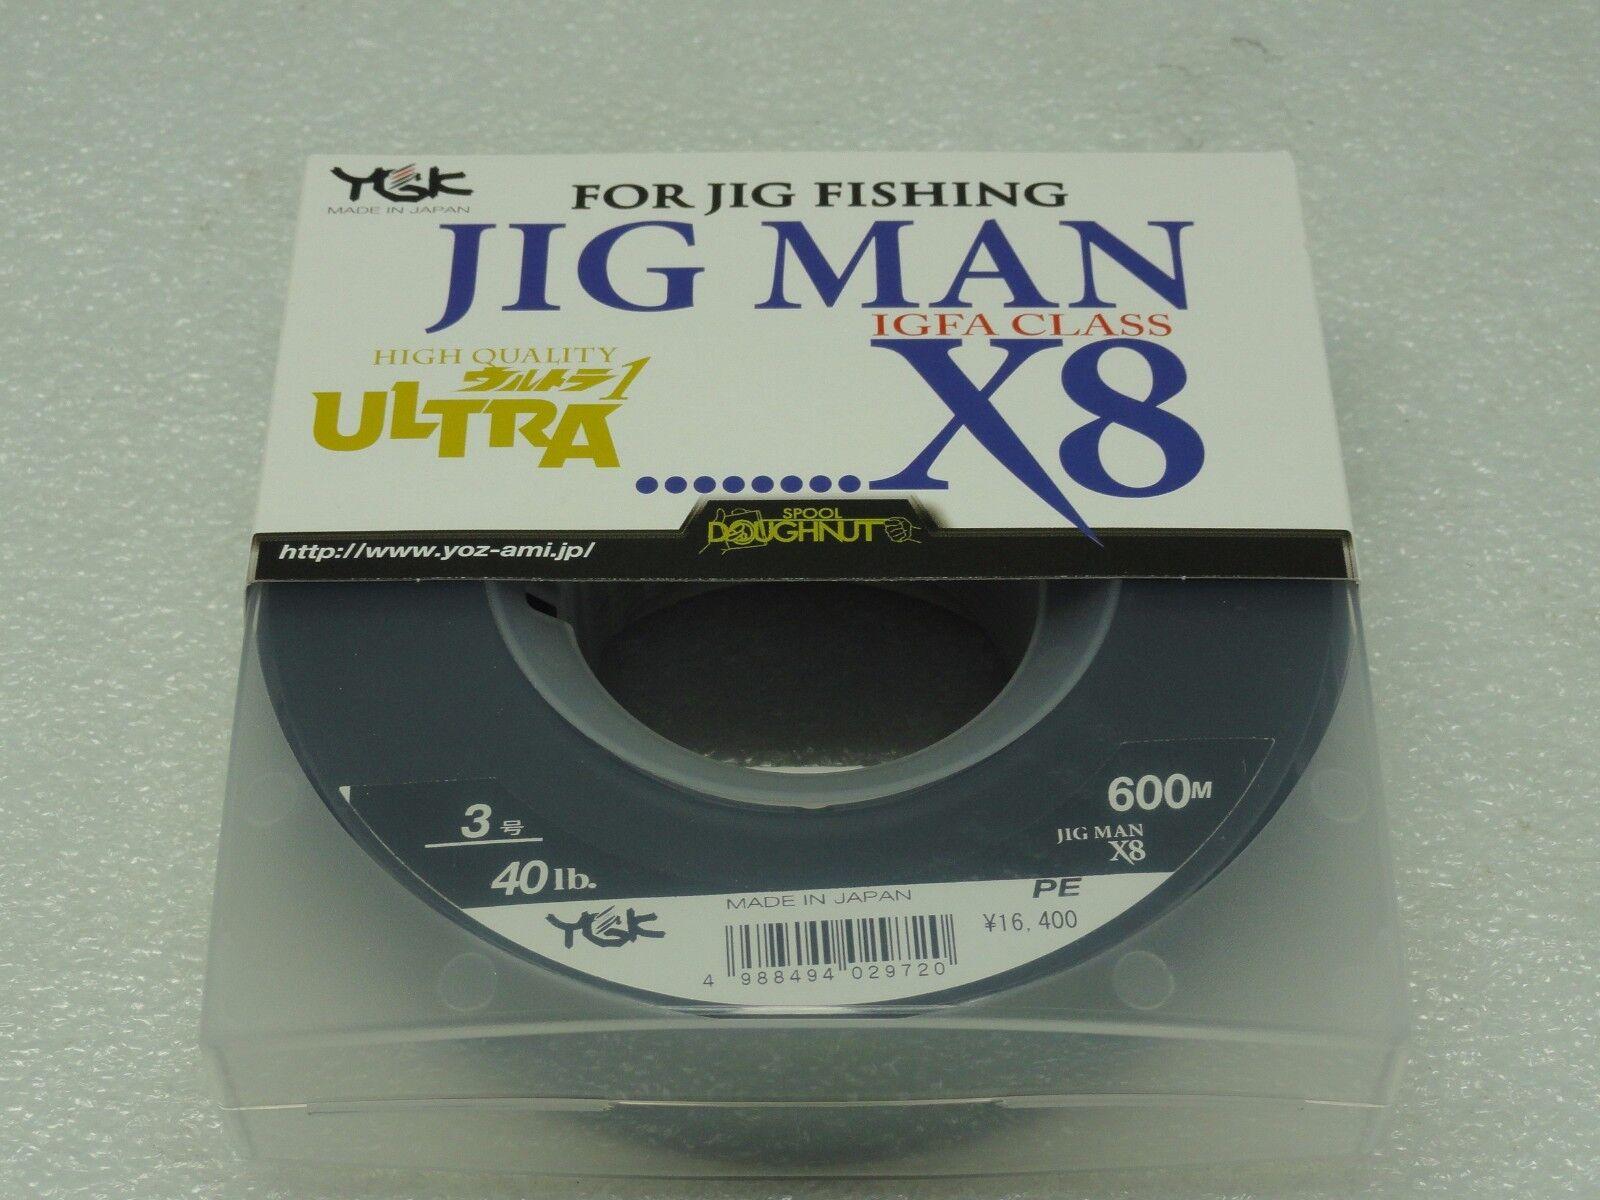 YGK JIG MAN IGFA CLASS X8 8 Braided PE 3 line SPECTRA lb 600m Made in Japan